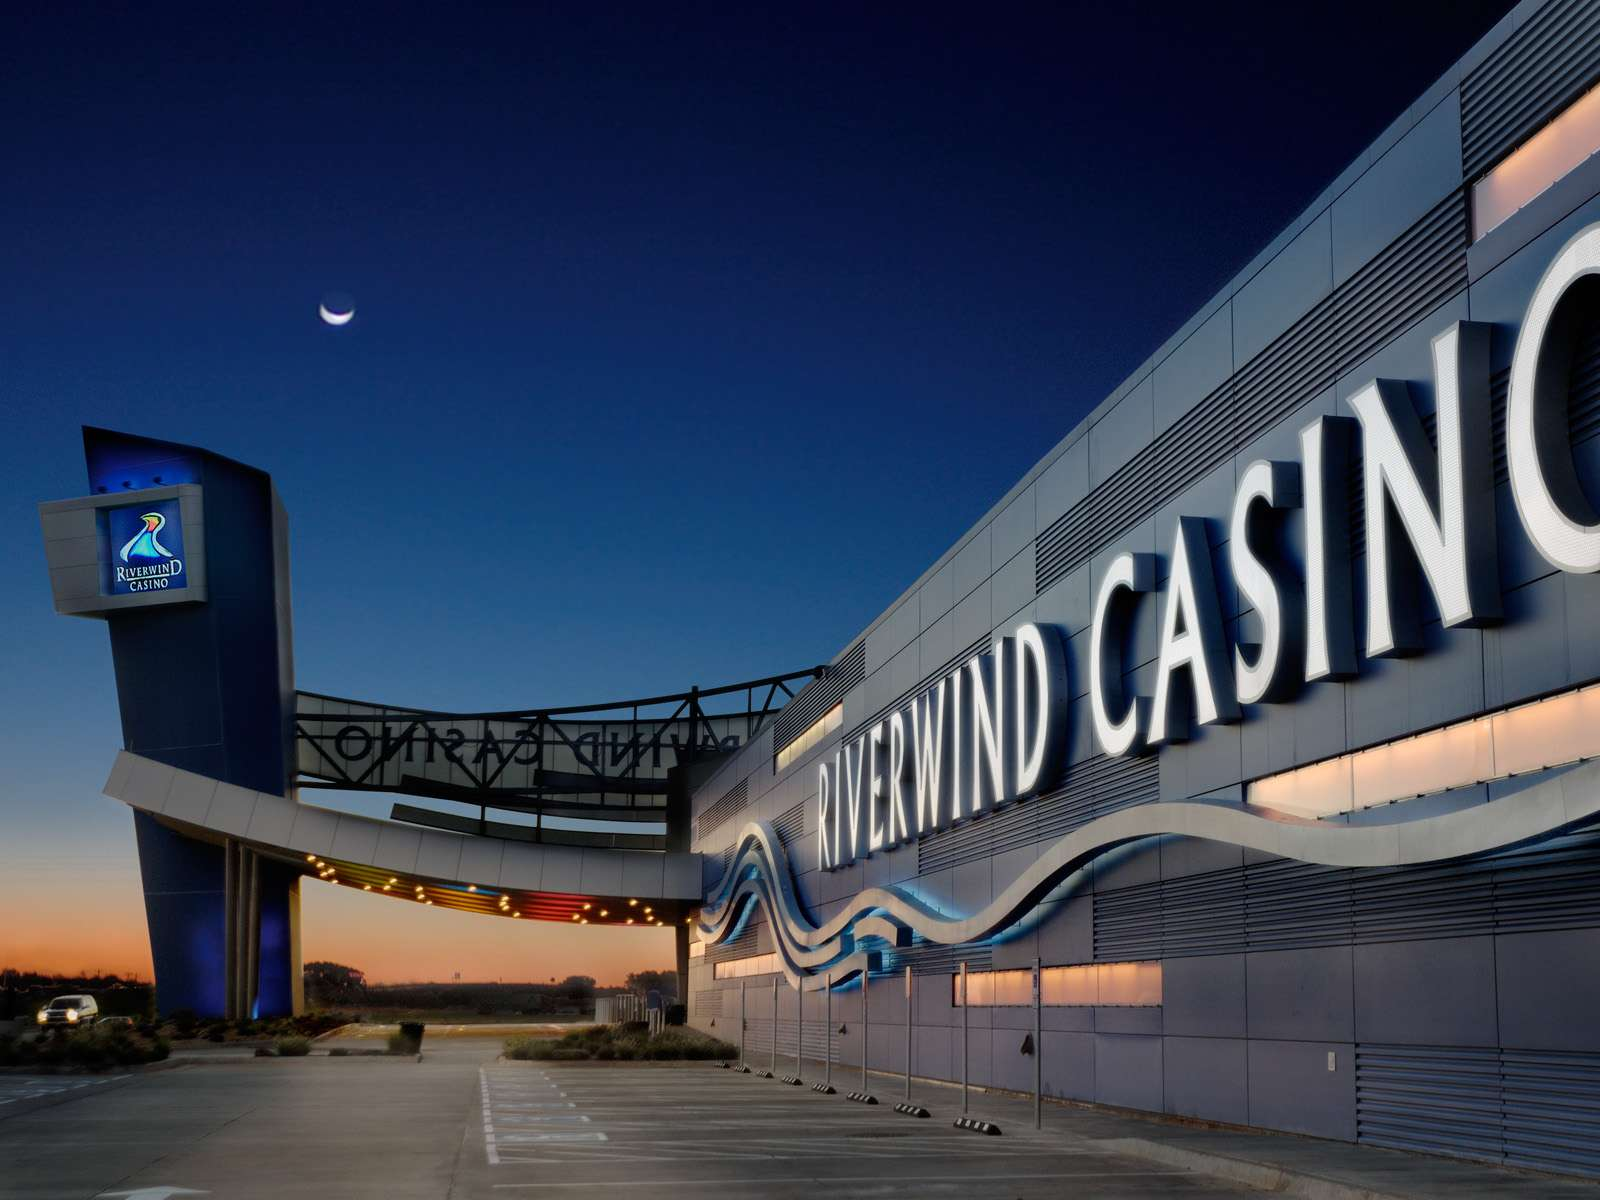 Riverwind casino and resort norman oklahoma ho chunck casino wi dells